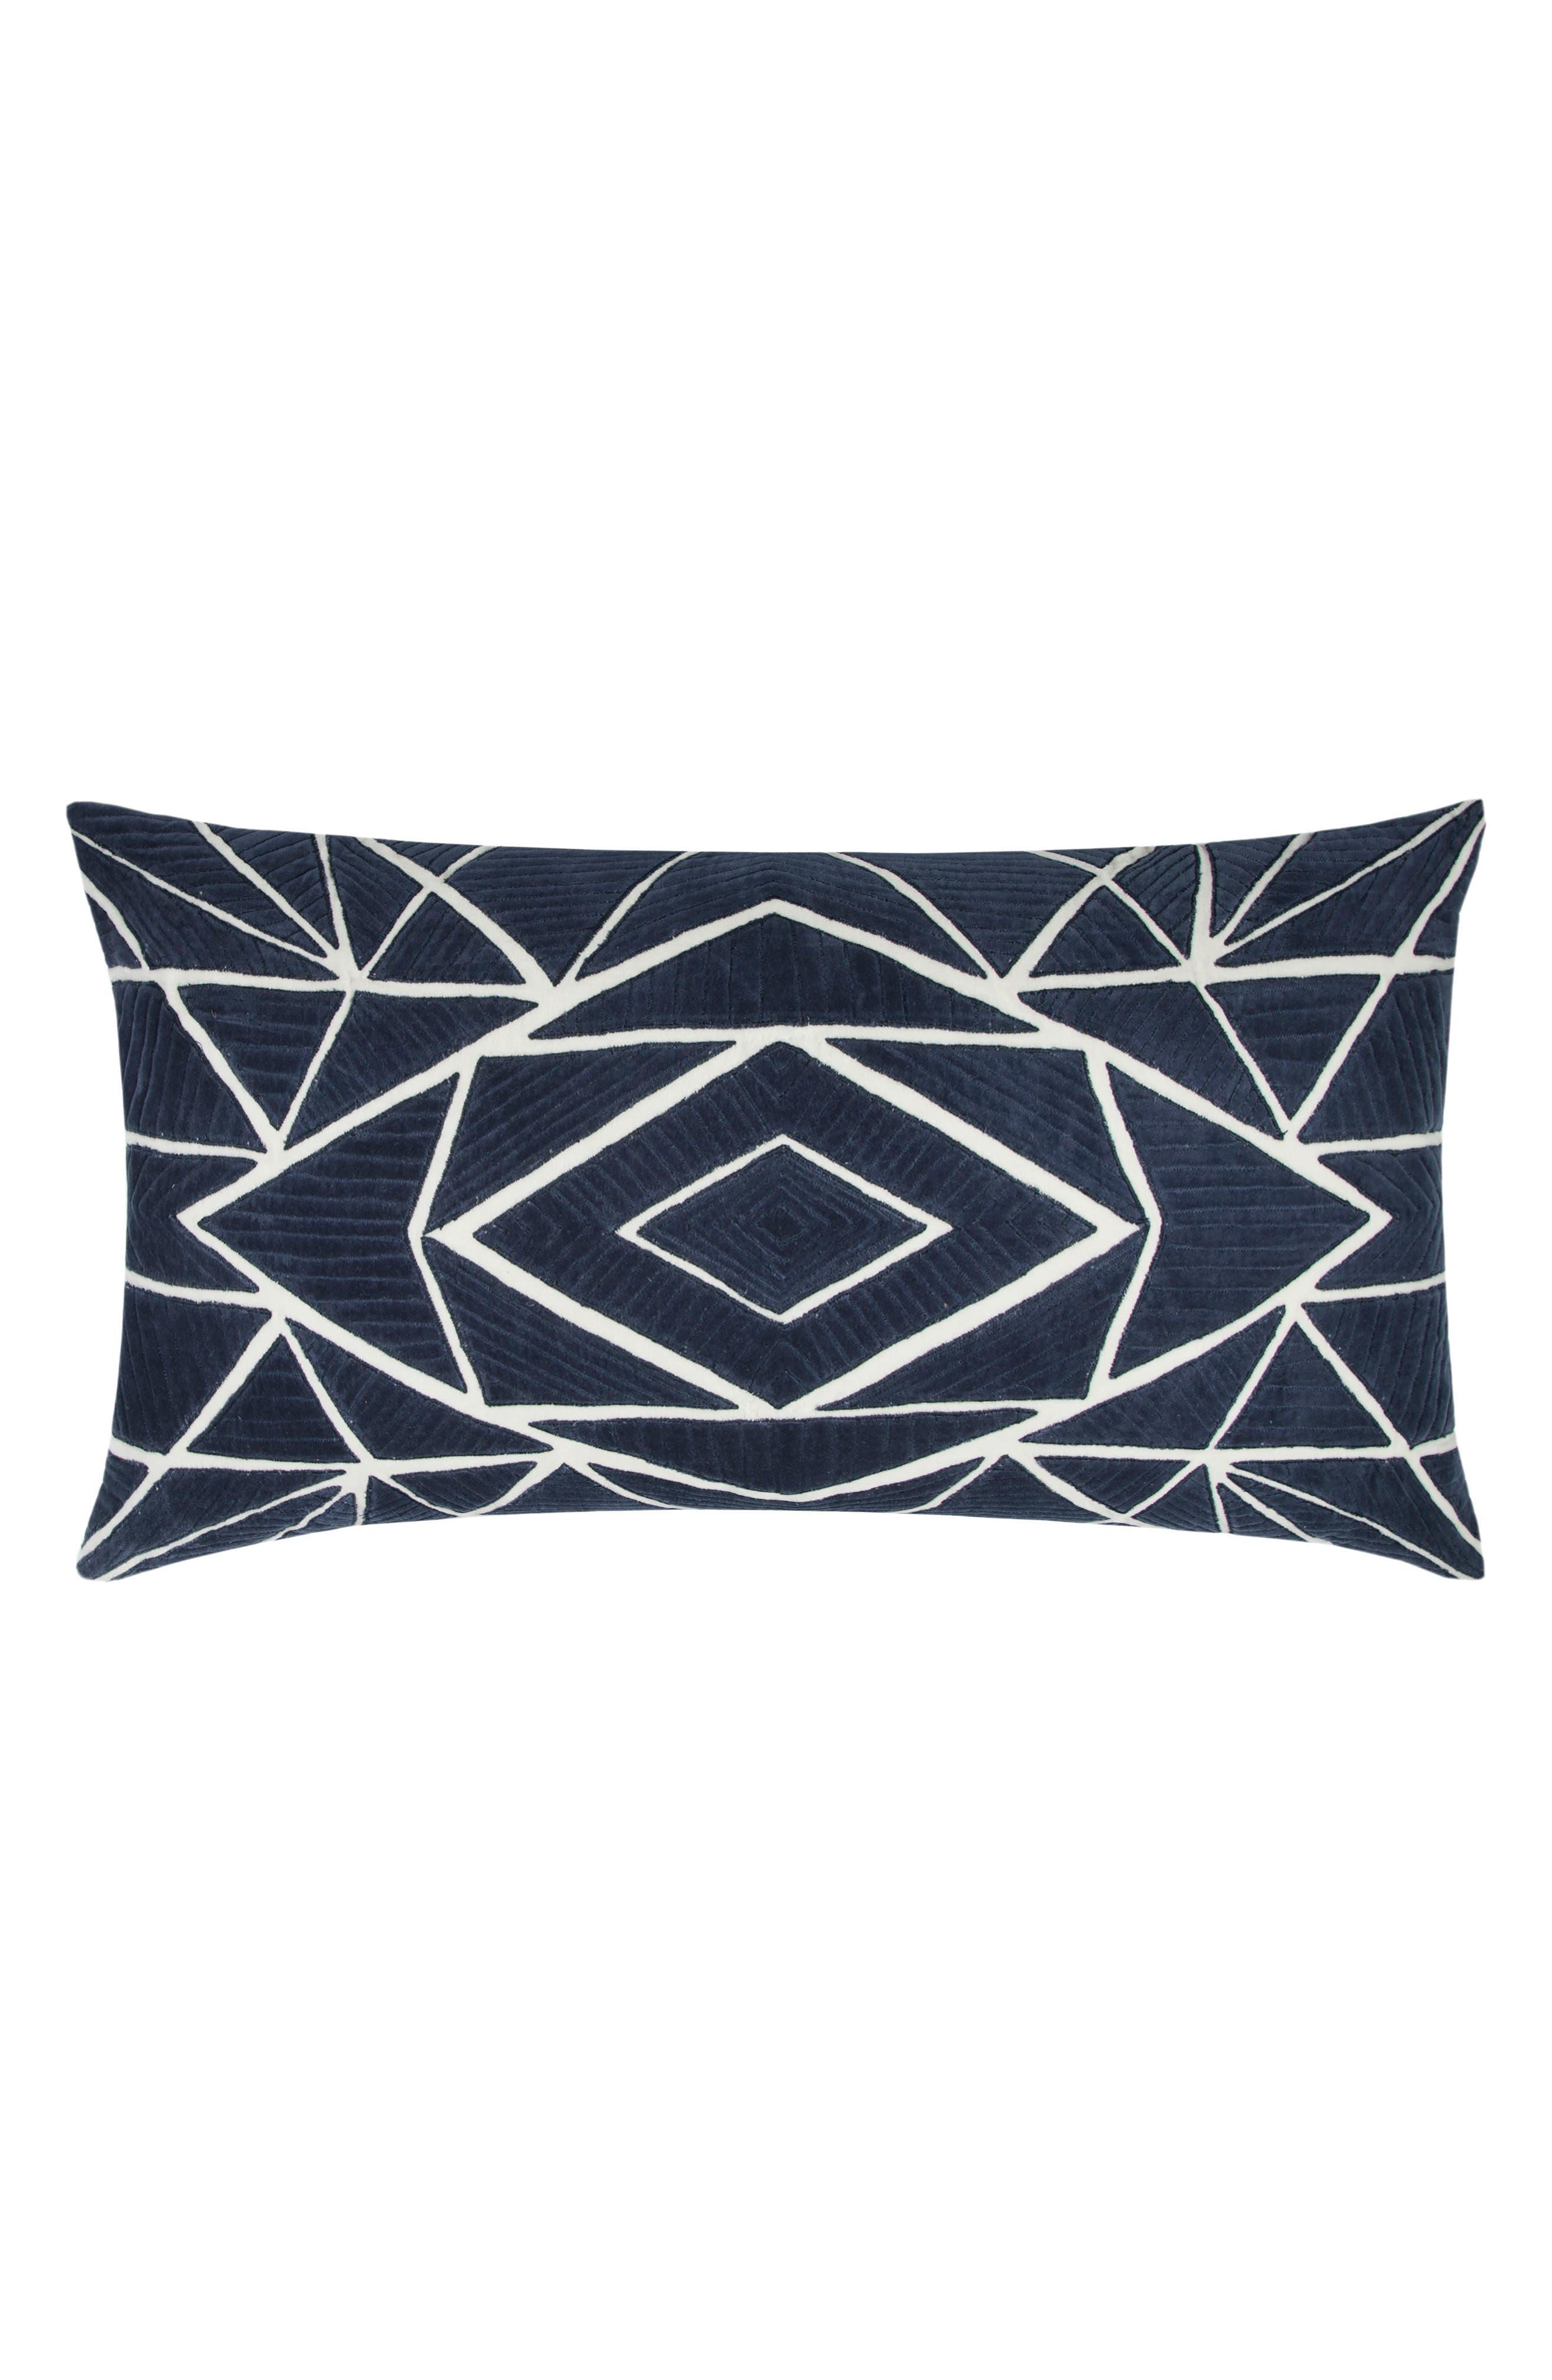 Geometric Accent Pillow,                         Main,                         color, Indigo